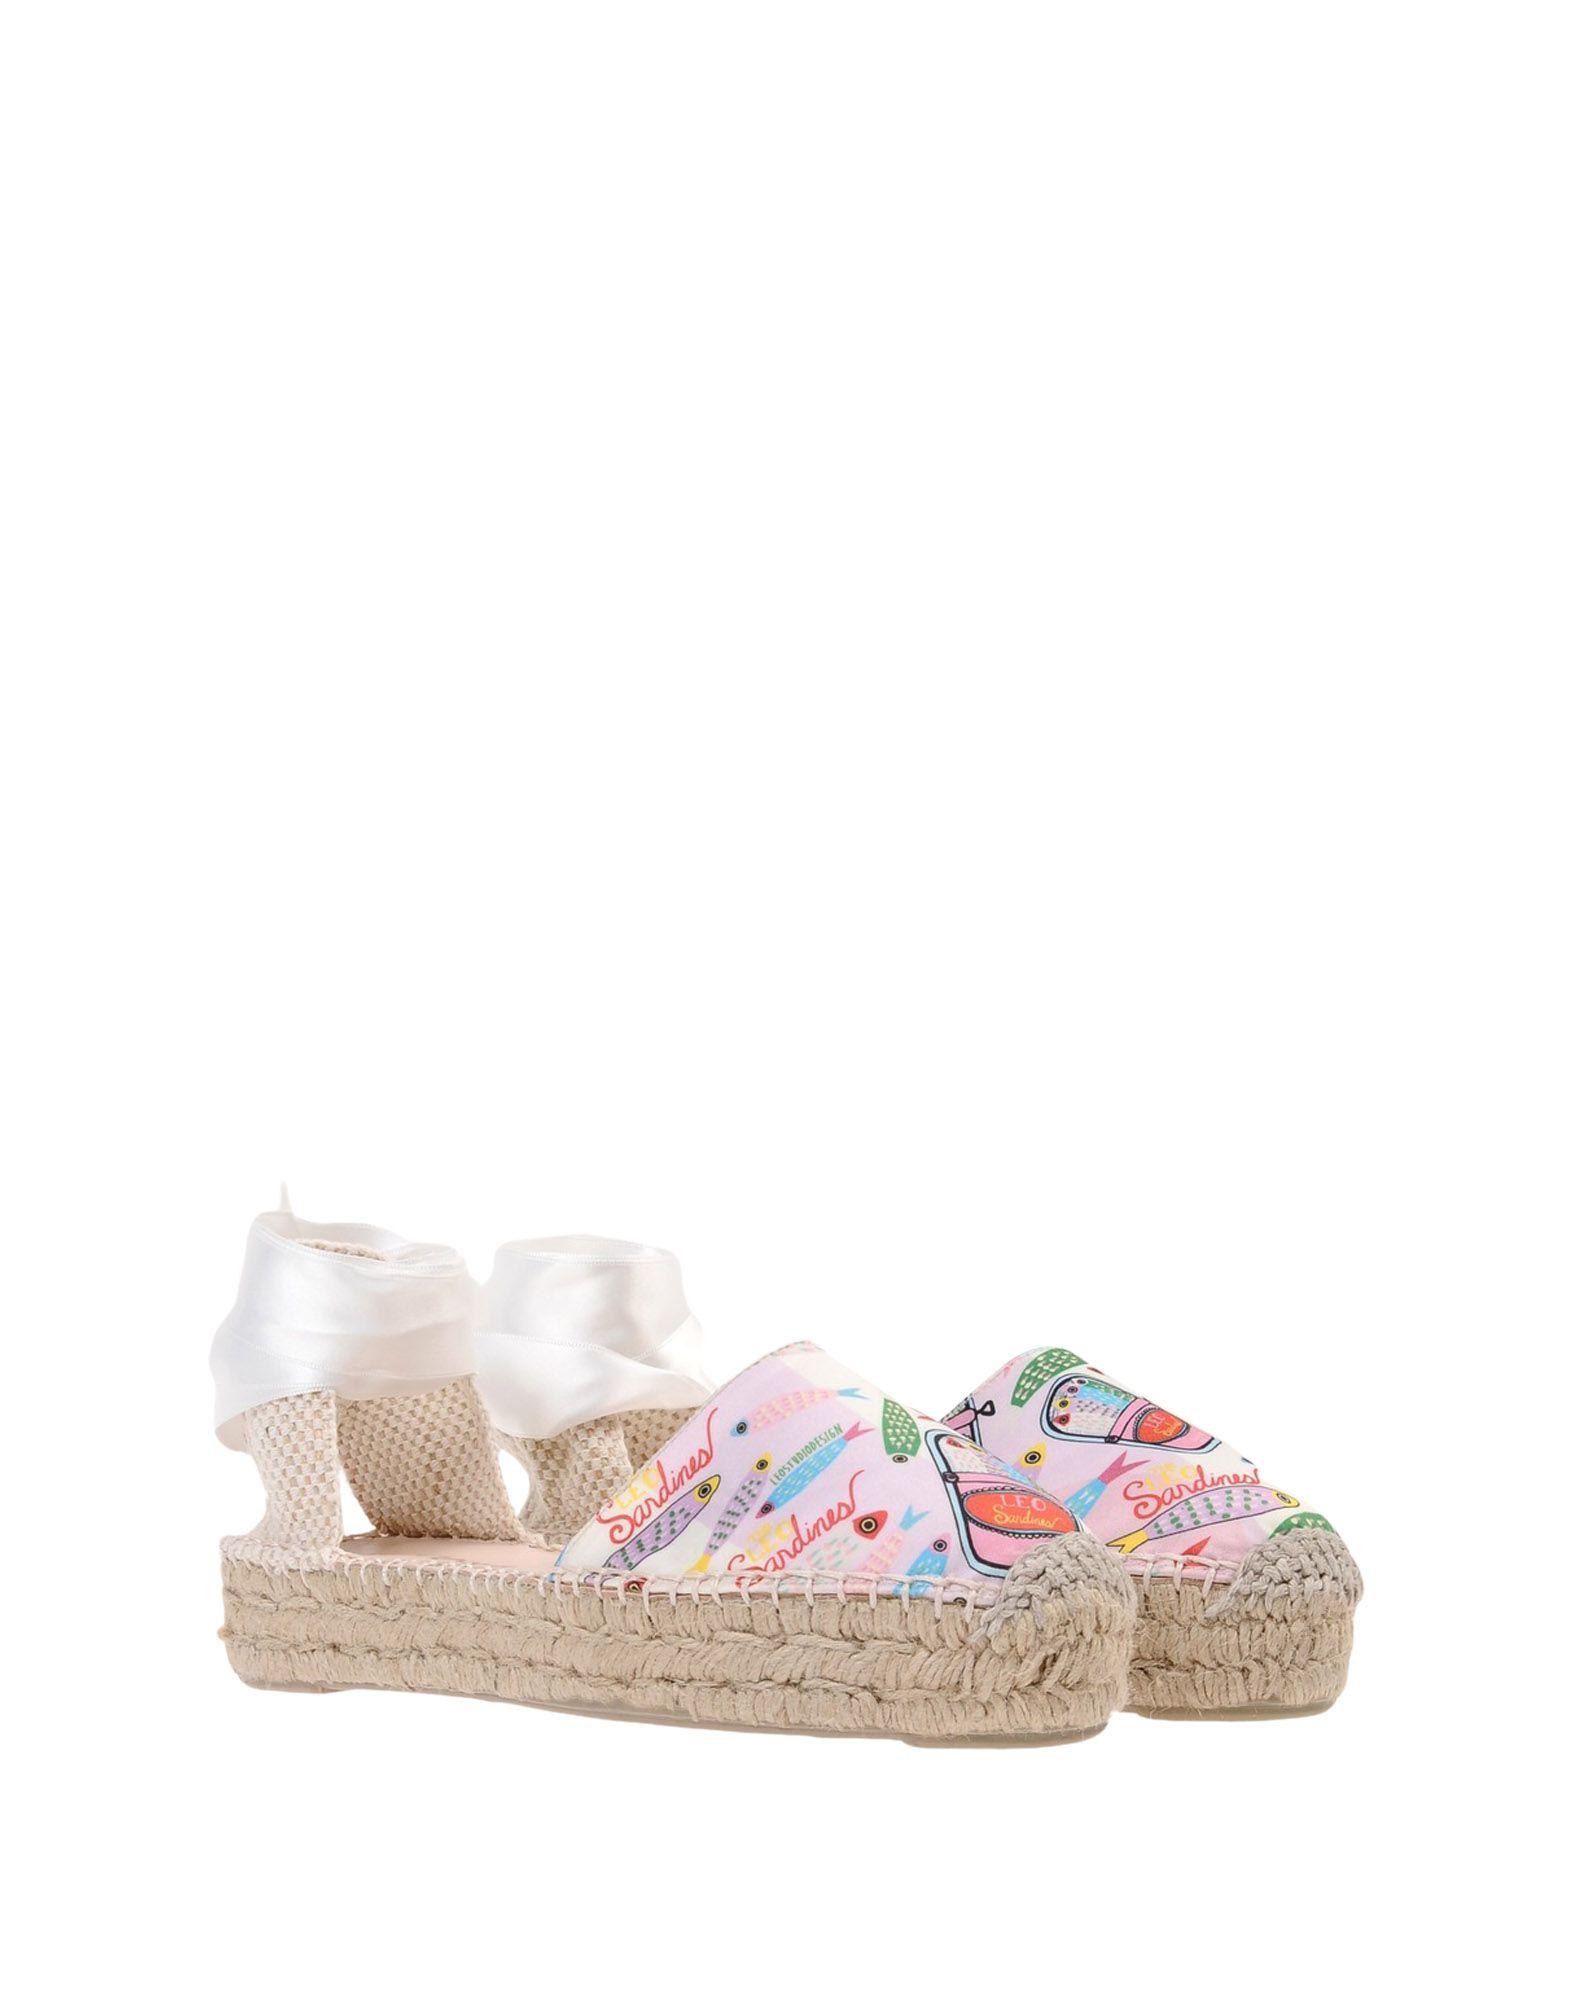 Leo Studio Design Lace Up Satin Espadrilles  11457407BU Gute Qualität beliebte Schuhe